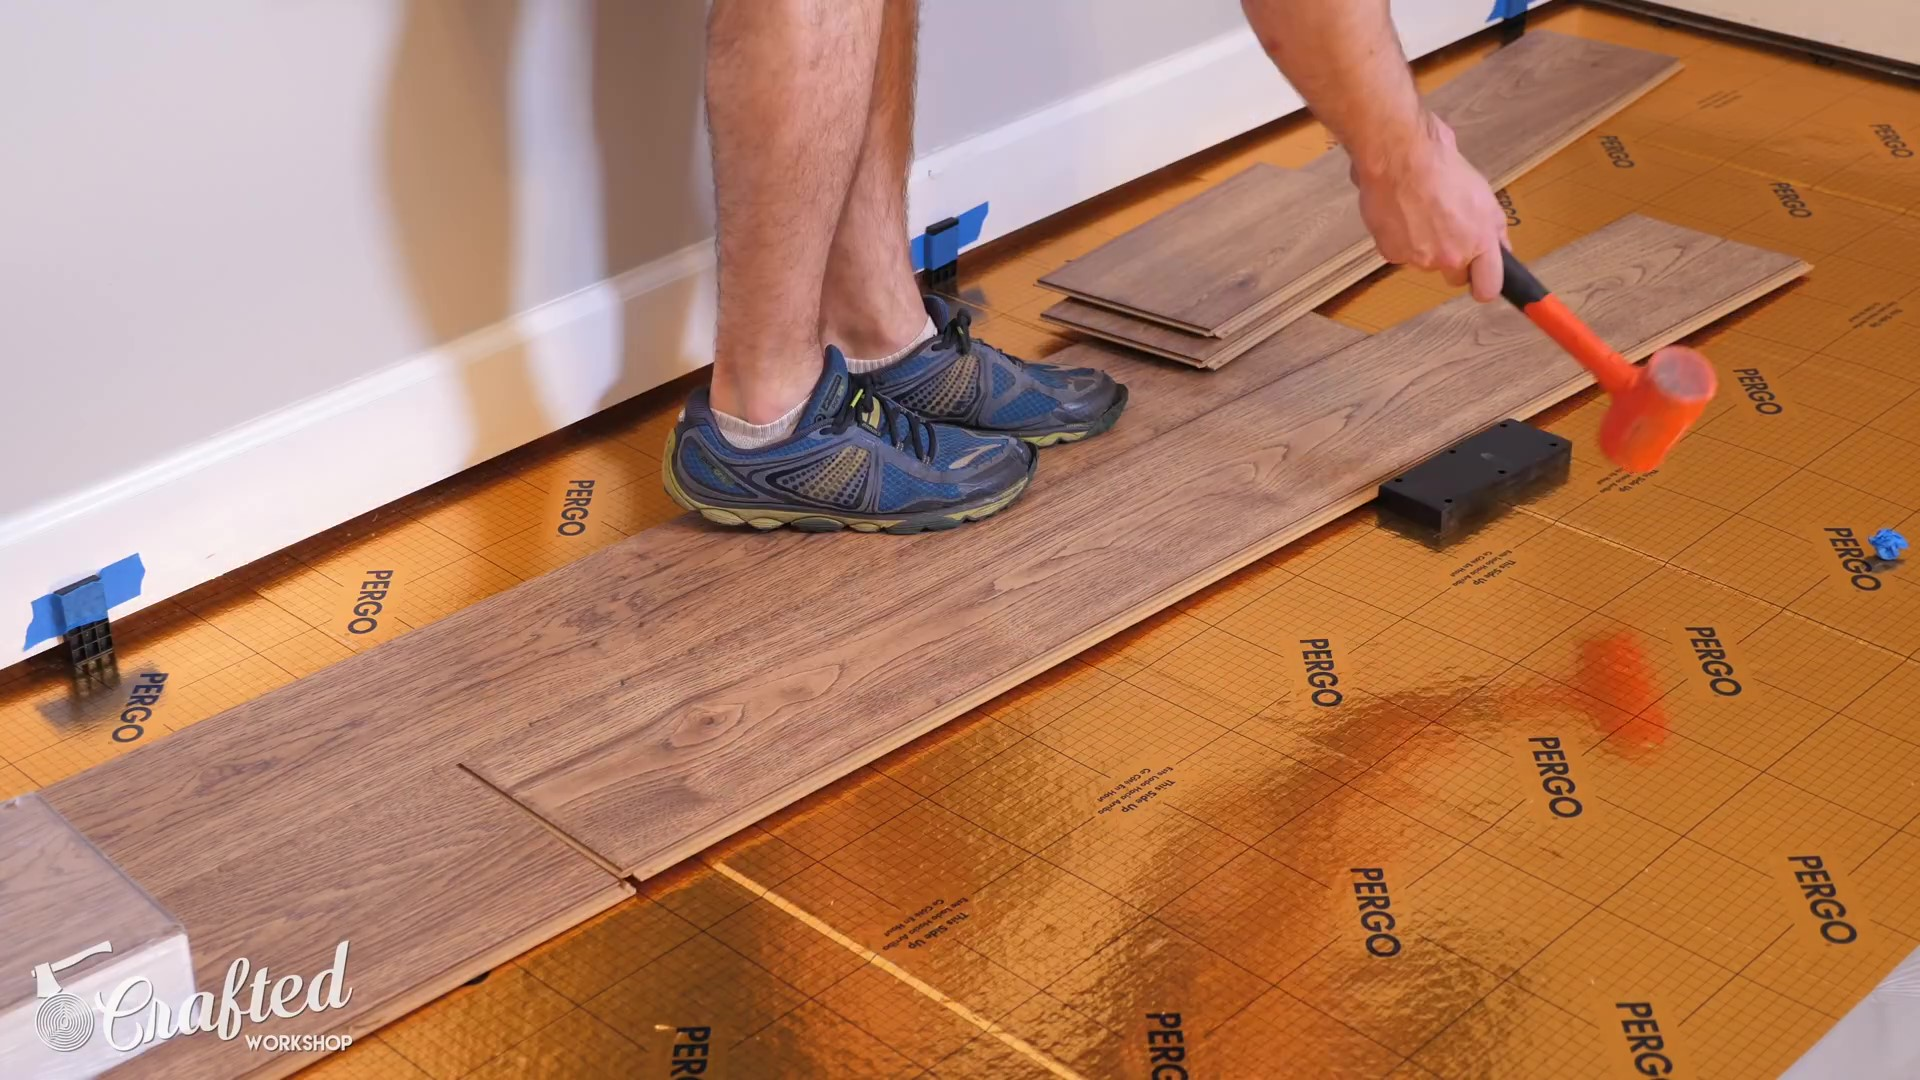 Installing Laminate Flooring For The